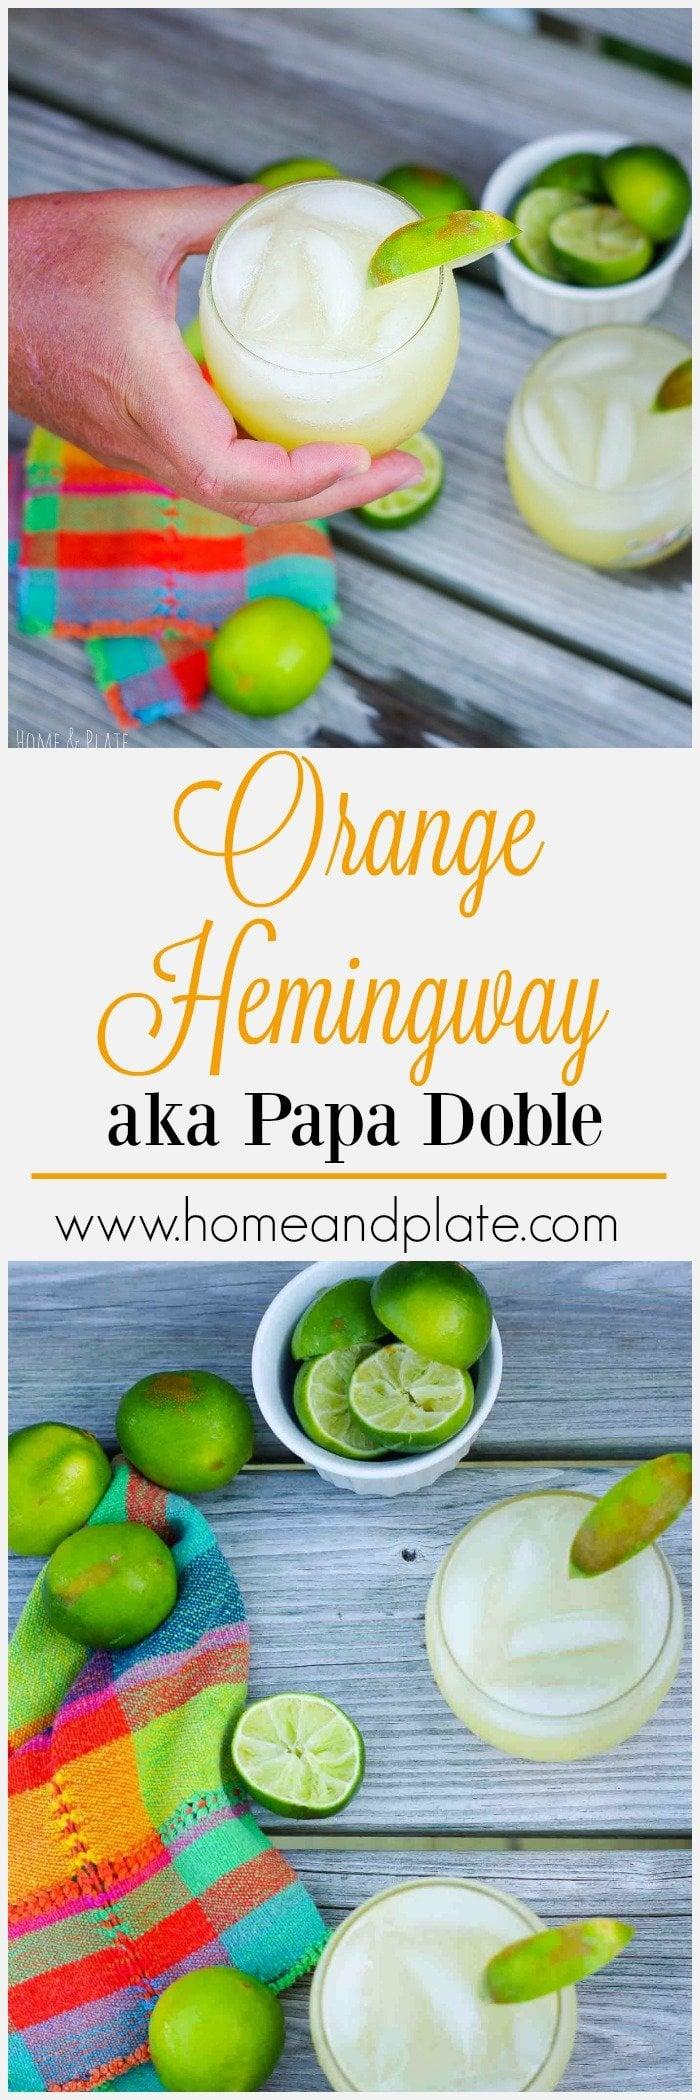 Orange Hemingway aka Papa Doble | www.homeplate.com | Skip the sweet stuff and serve up this tart Orange Hemingway in true daiquiri style.